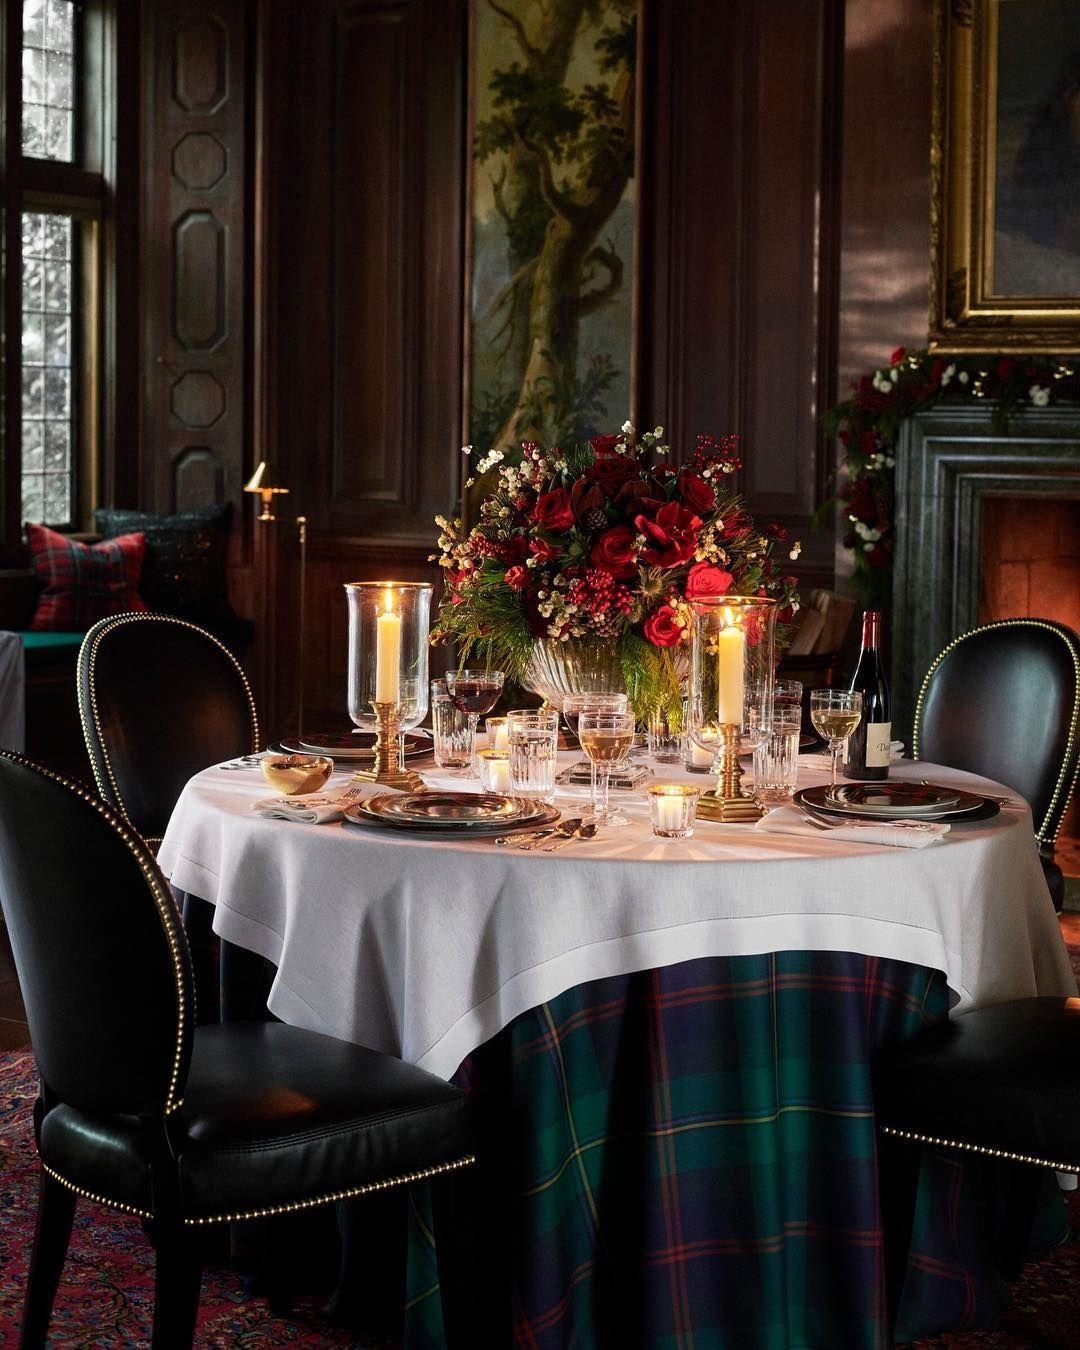 Home Decor Home Furnishings Bedding And Bath Ralph Lauren Home Decor Ralph Lauren Home Table Decorations